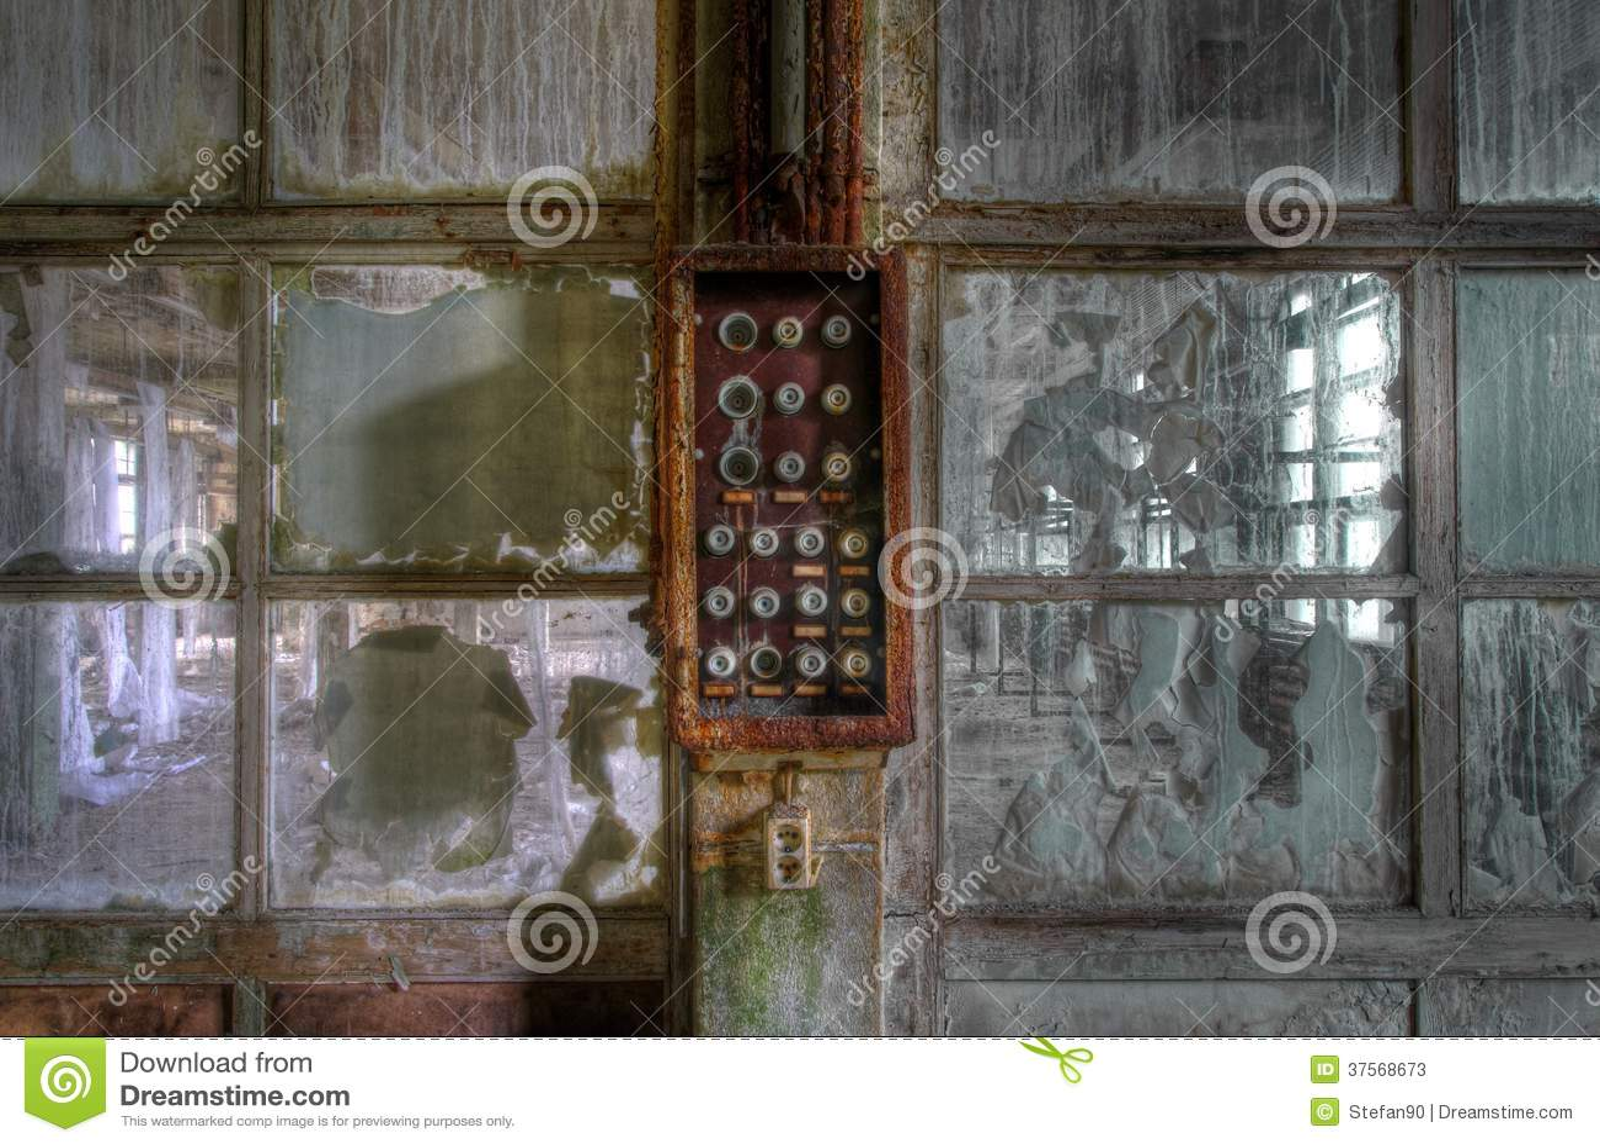 old abandoned fuse box stock image image of panel destroyed 37568673 rh dreamstime com